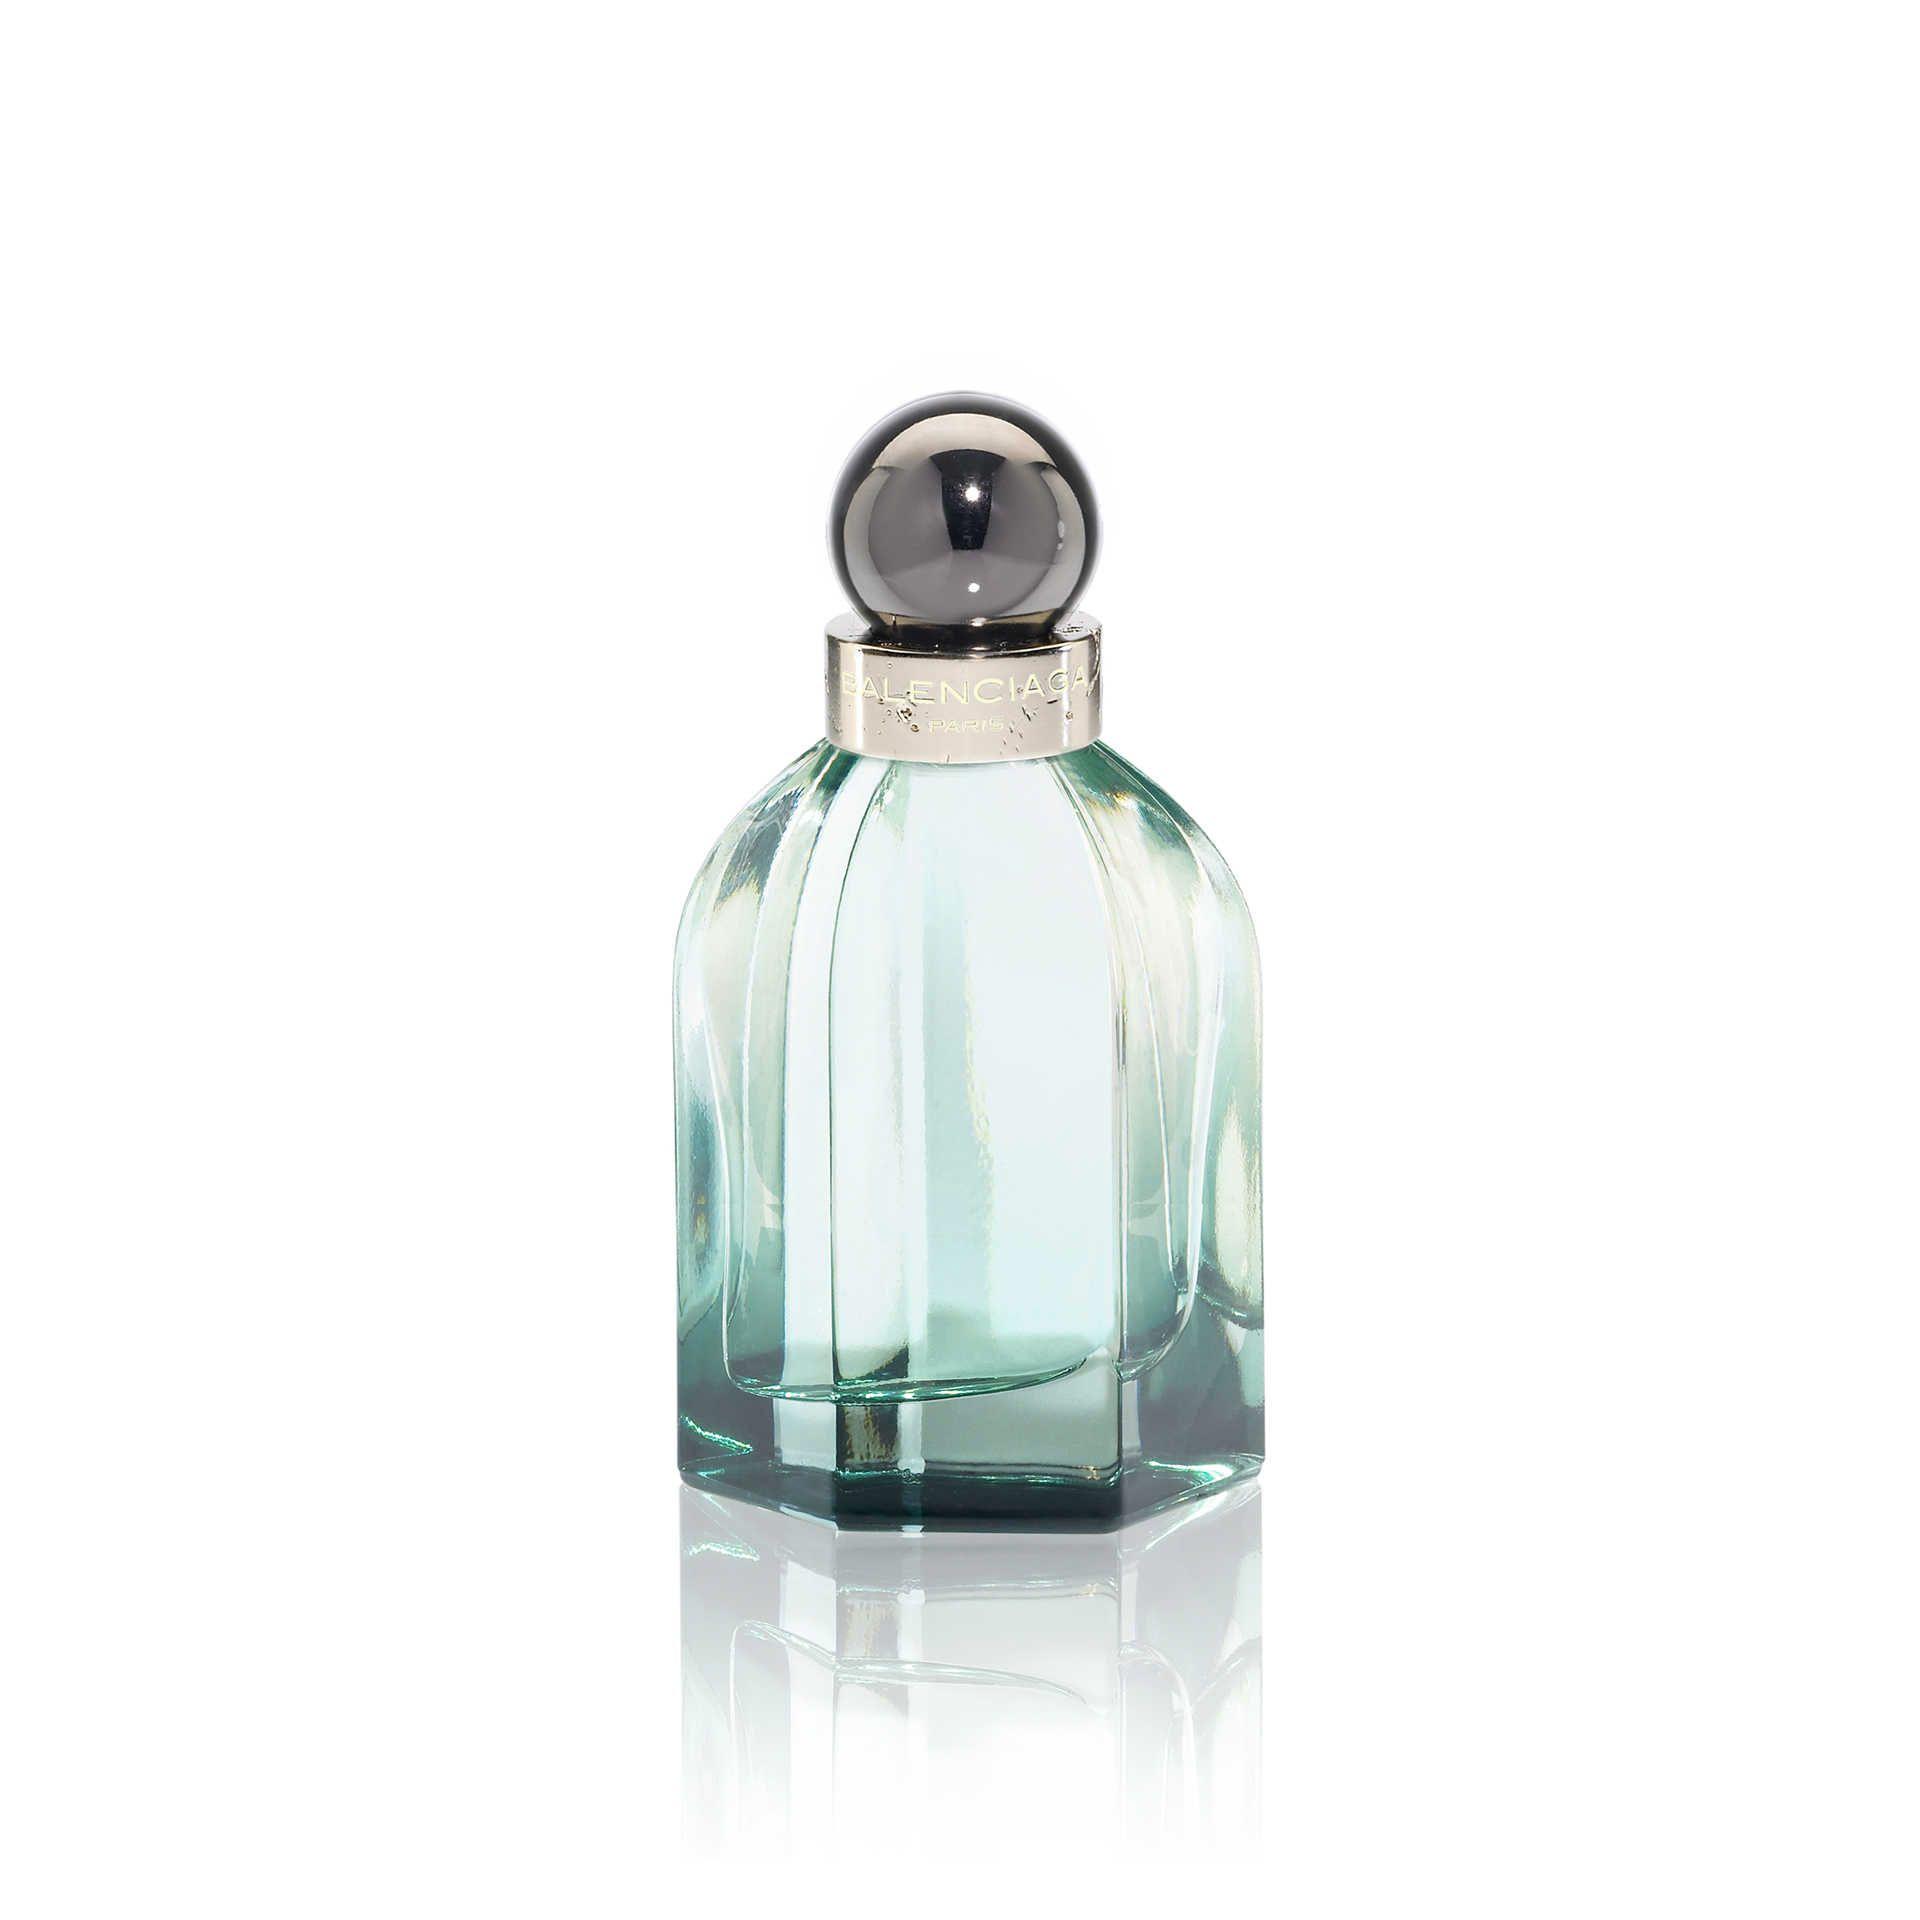 BALENCIAGA Balenciaga L'Essence Eau De Parfum 50Ml Perfume D f